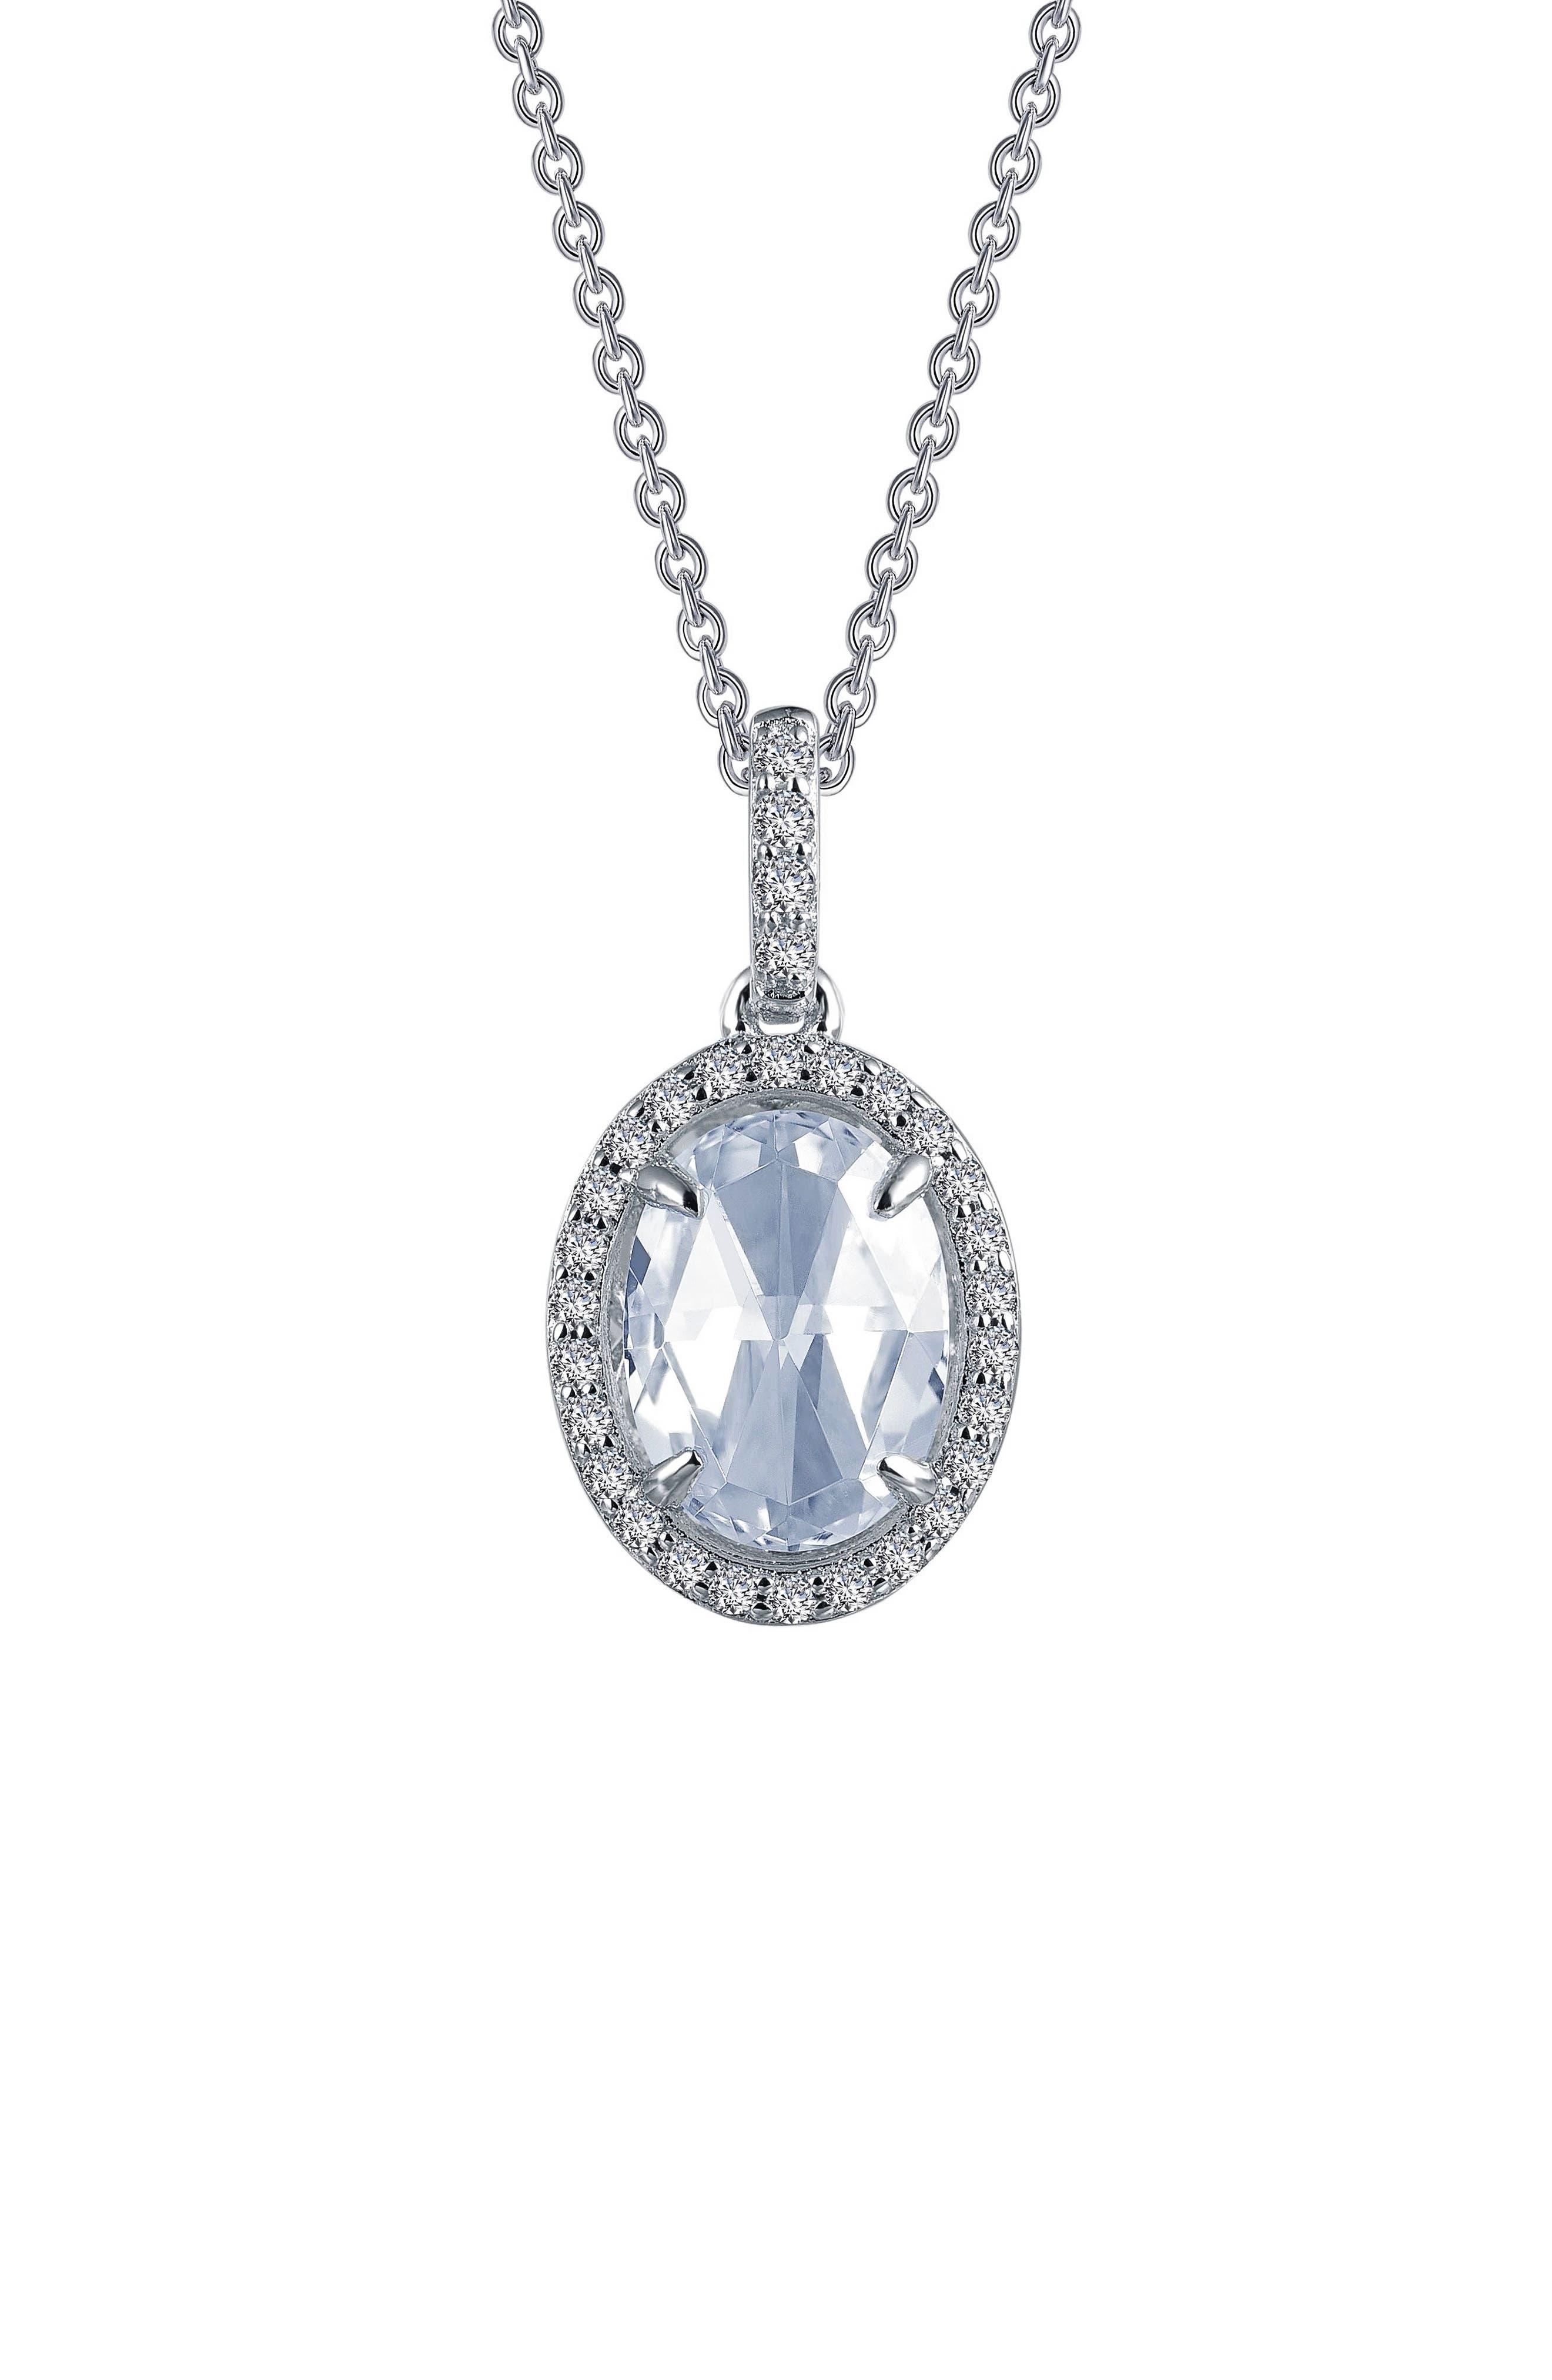 Rose Cut Simulated Diamond Pendant Necklace,                             Main thumbnail 1, color,                             SILVER